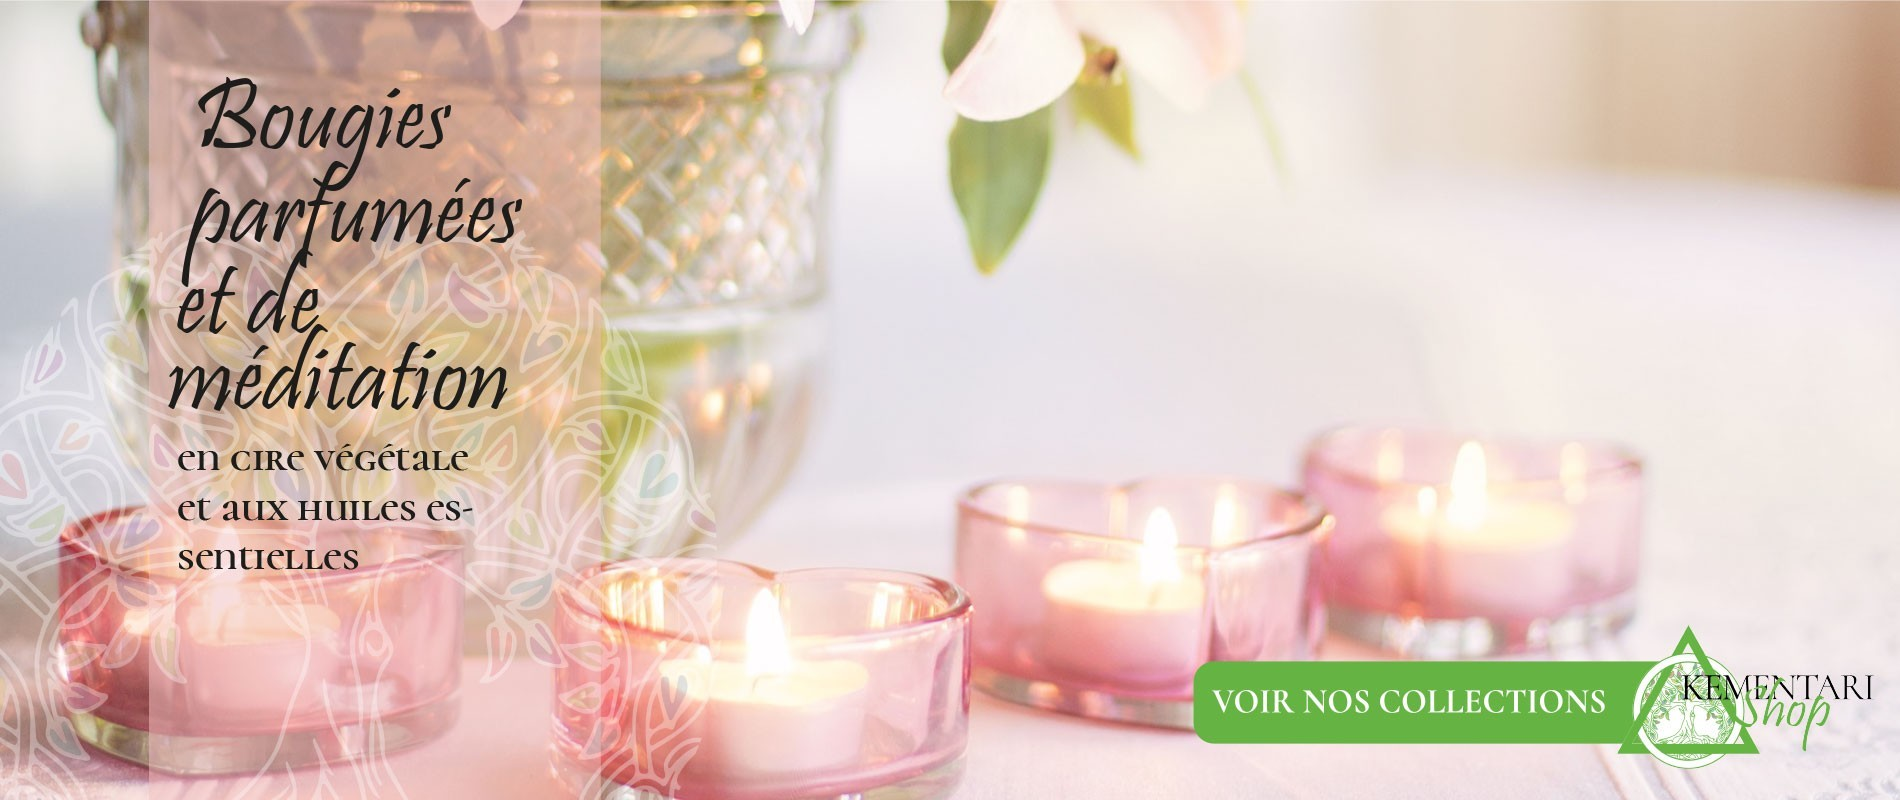 Bougies parfumées et bougies méditation